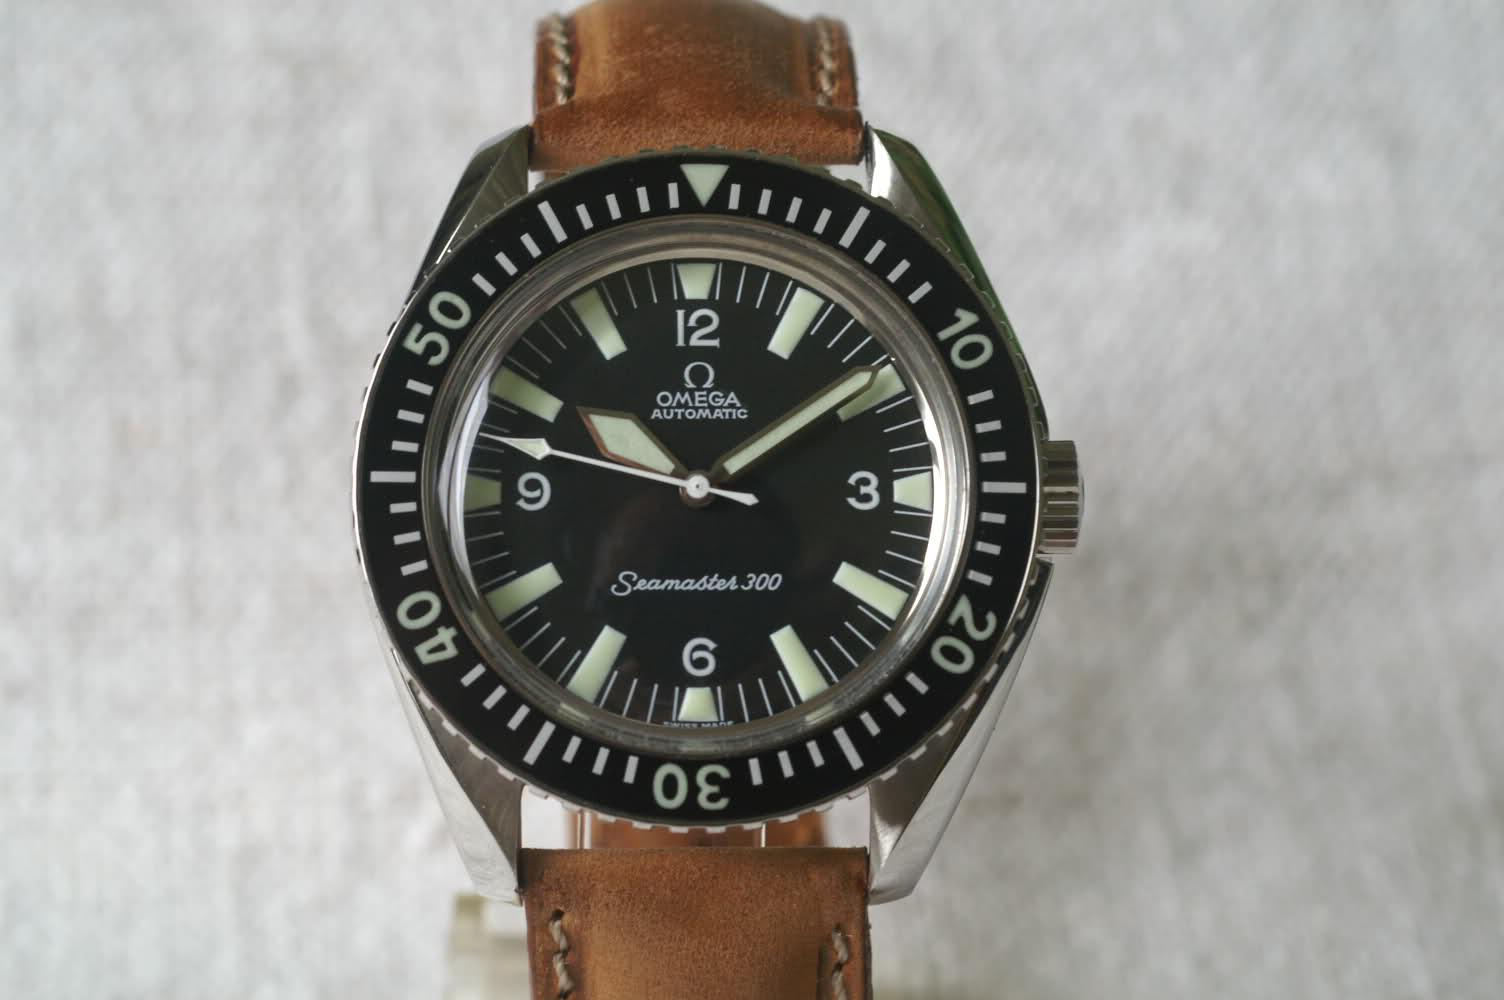 FEU de vos seamaster 300 vintage ou watchco Qrck5g